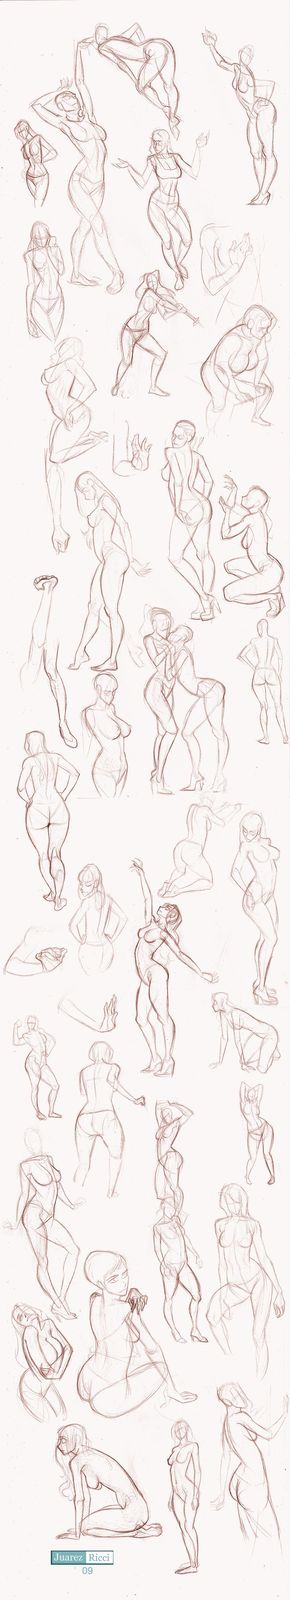 Tuto-Sketch: Estudio de la mujer   Dibujo   Pinterest   De las ...